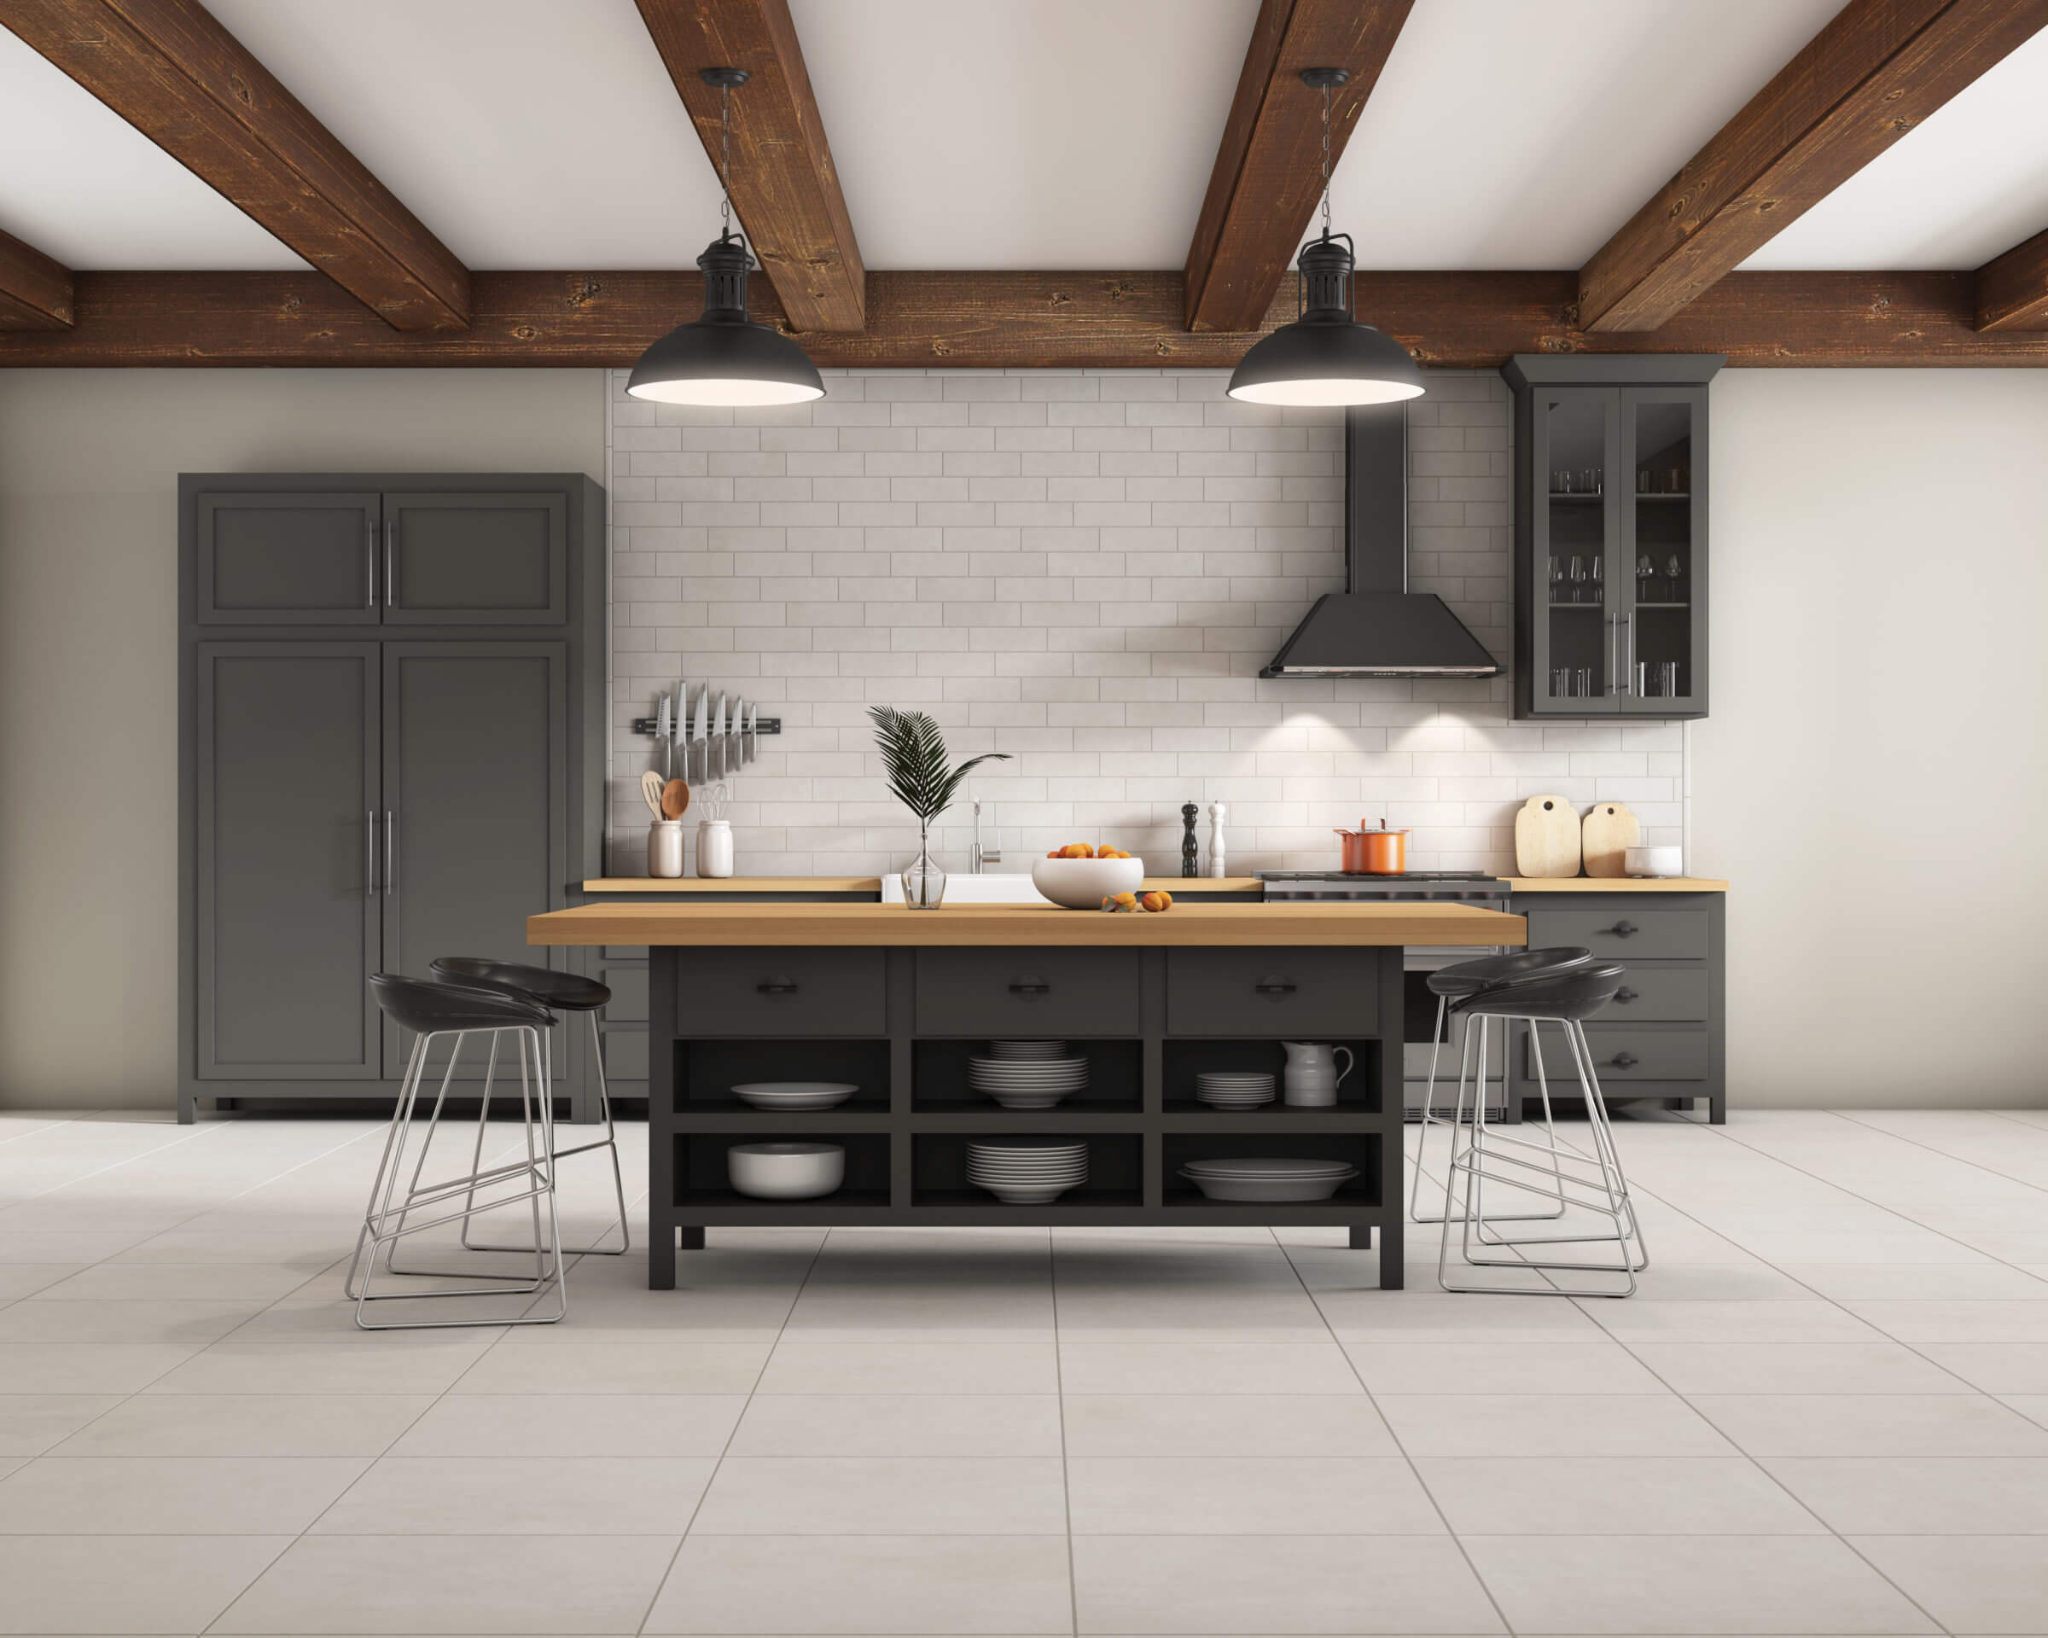 Kitchen with cream tile flooring and backsplash